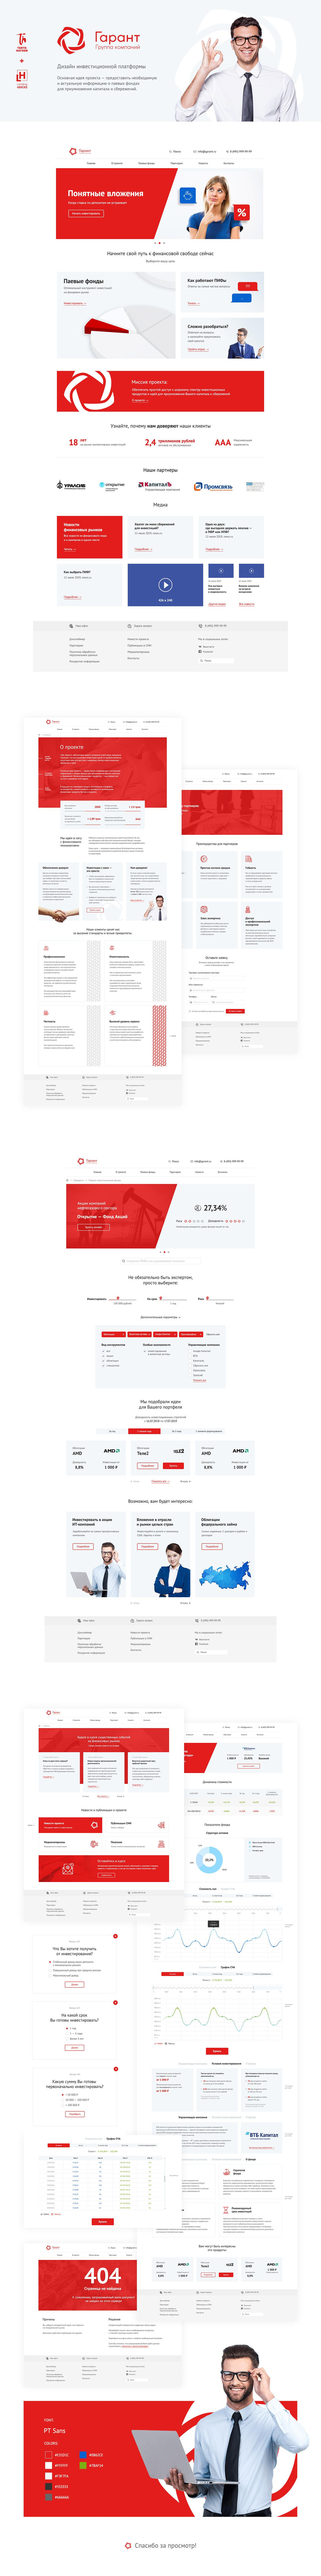 Design Platform UI ux Web Design